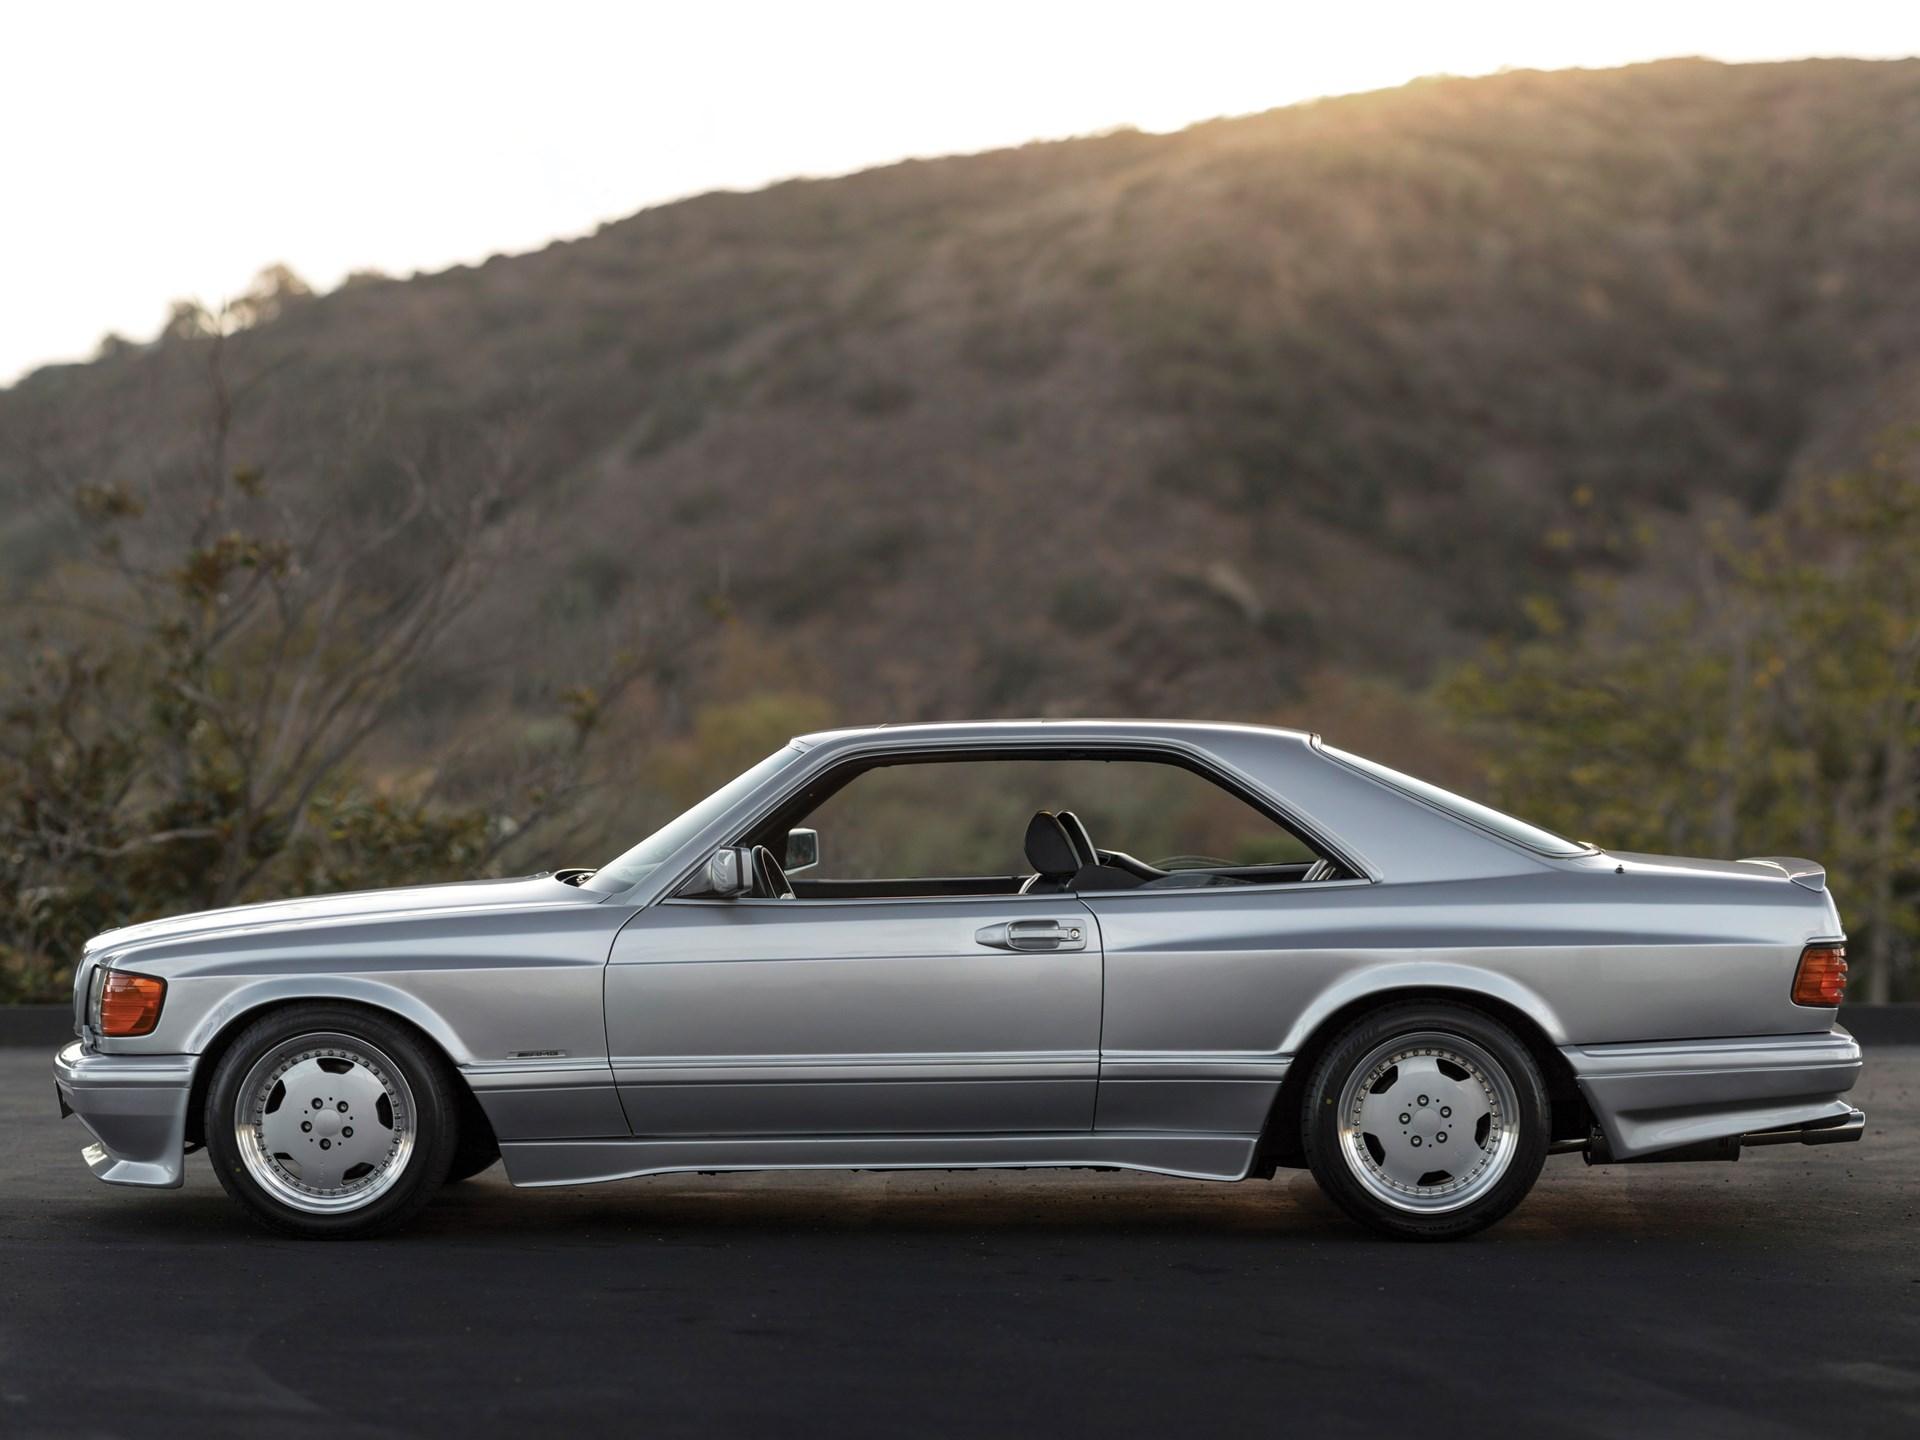 Rm Sothebys 1989 Mercedes Benz 560 Sec 60 Amg Wide Body 1991 500sl Timing Belt